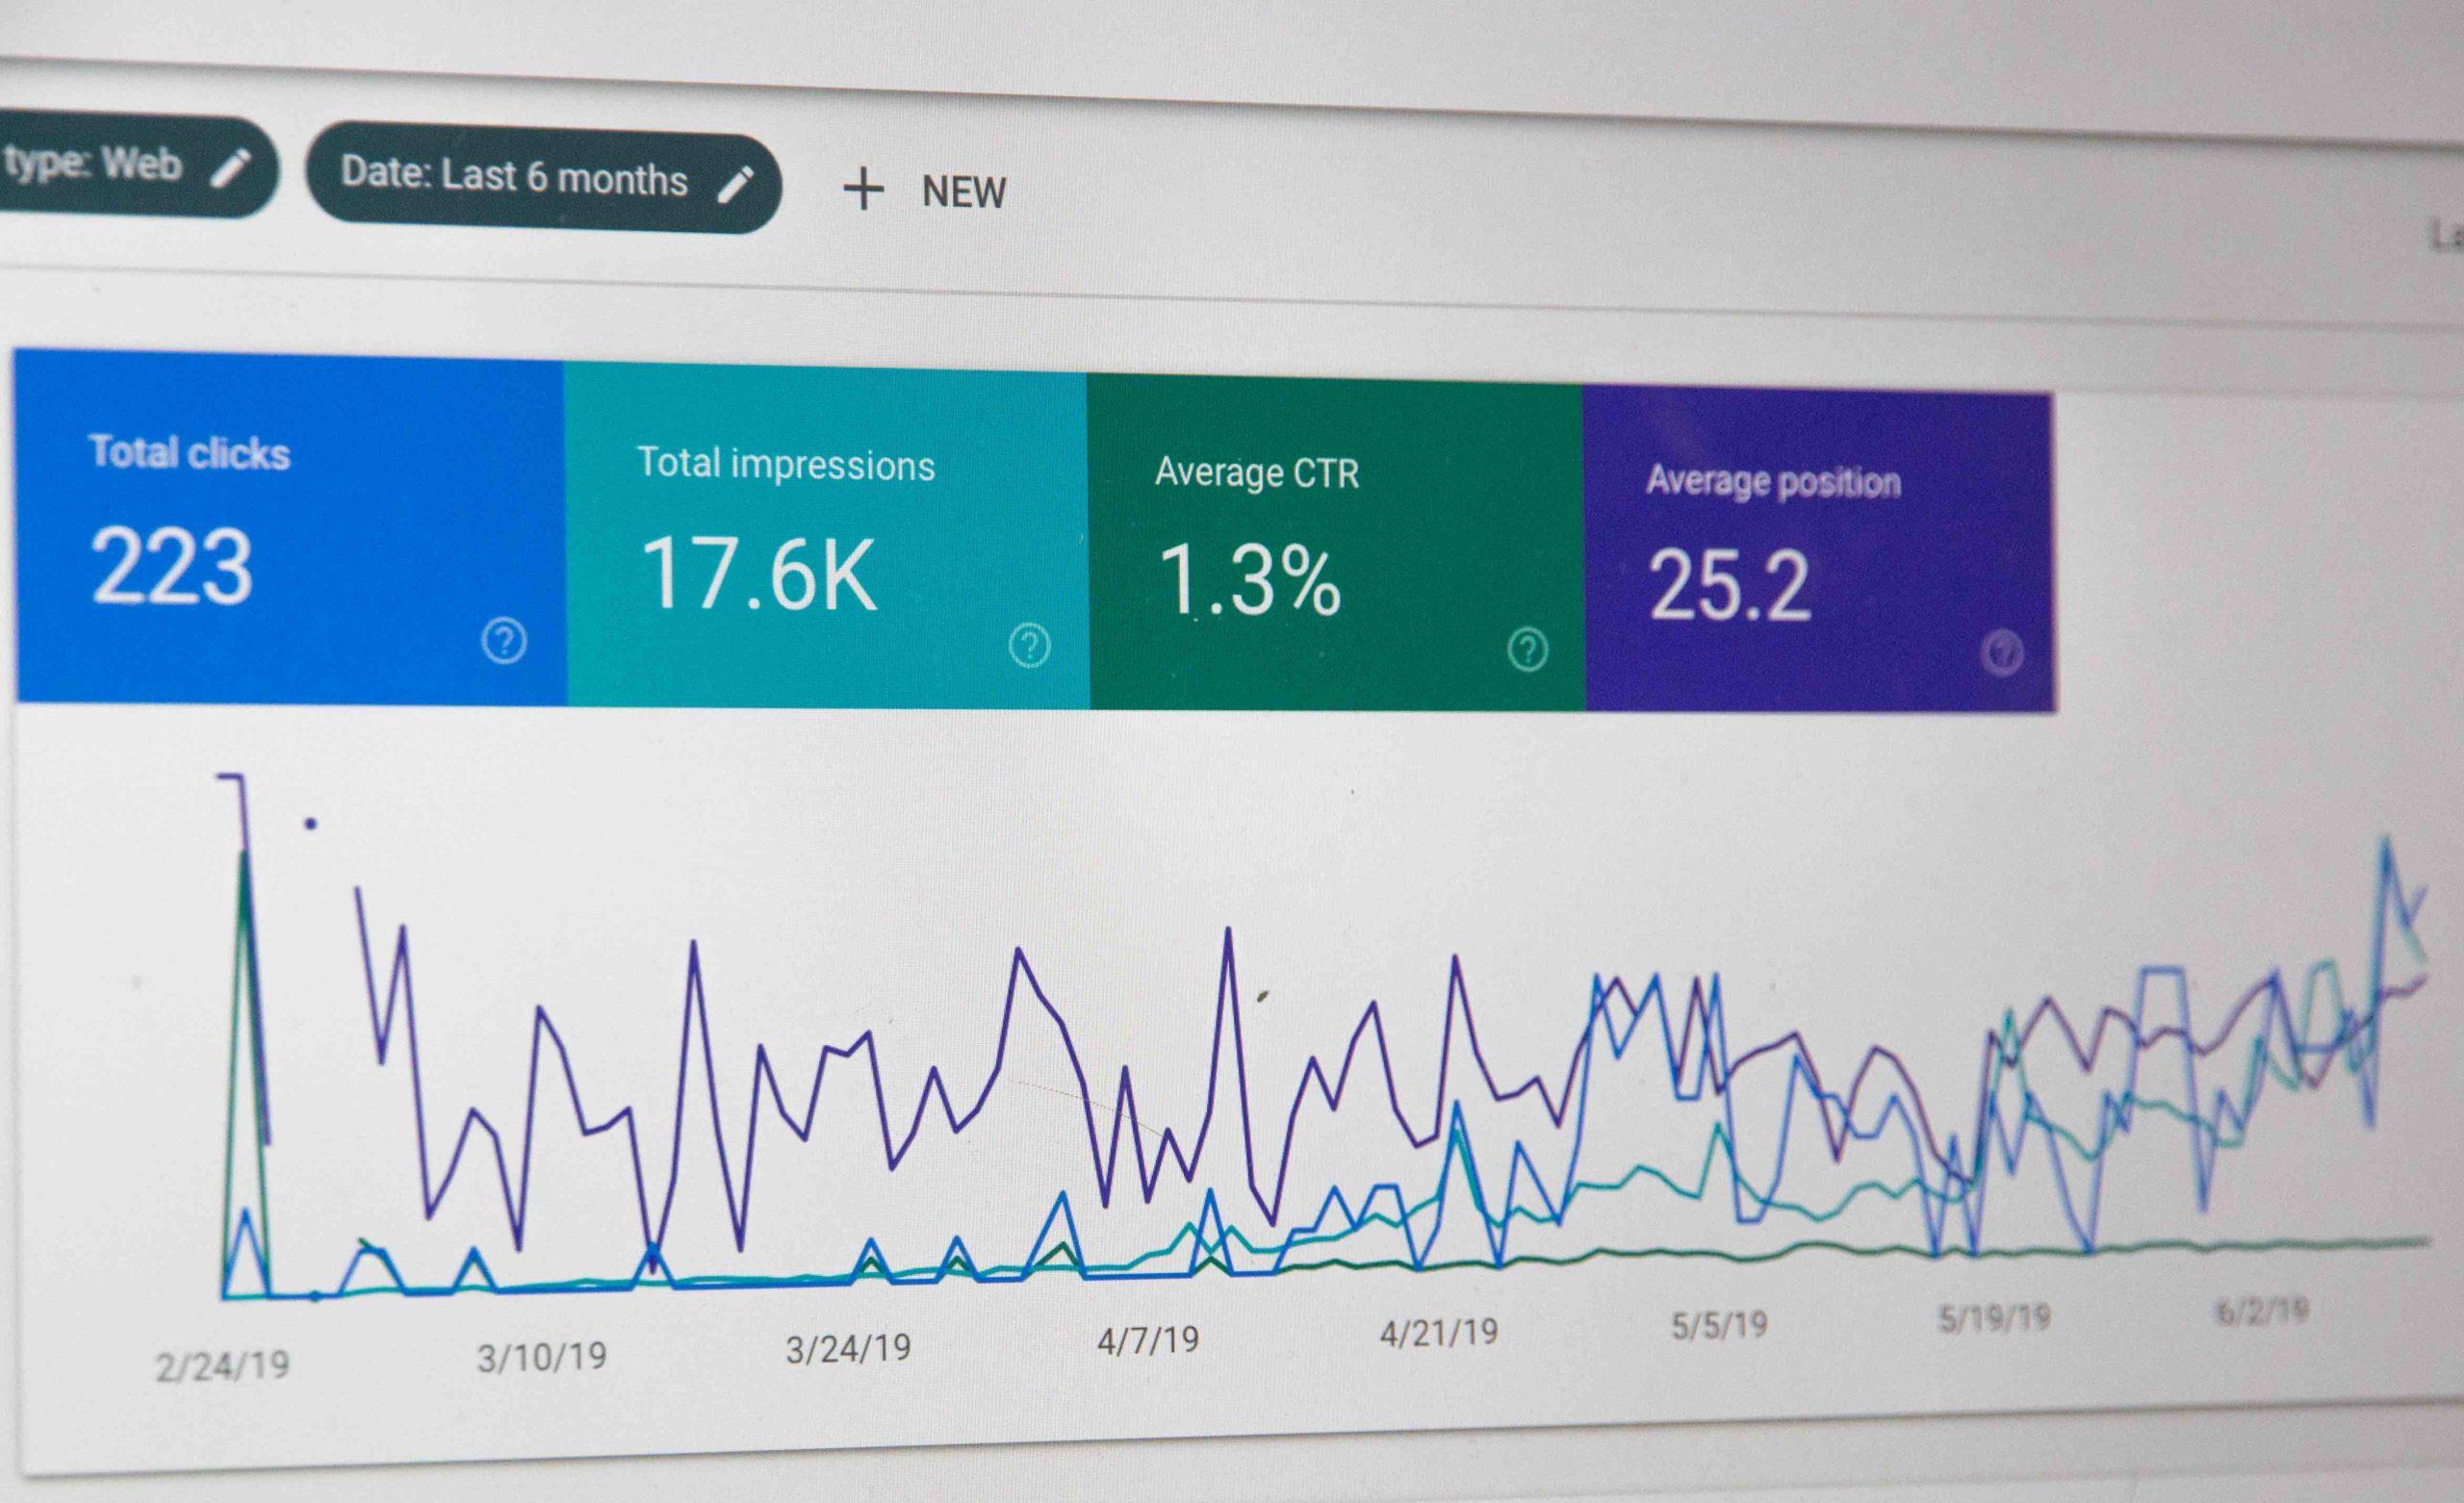 Content-Marketing-Tools-Google-Analytics